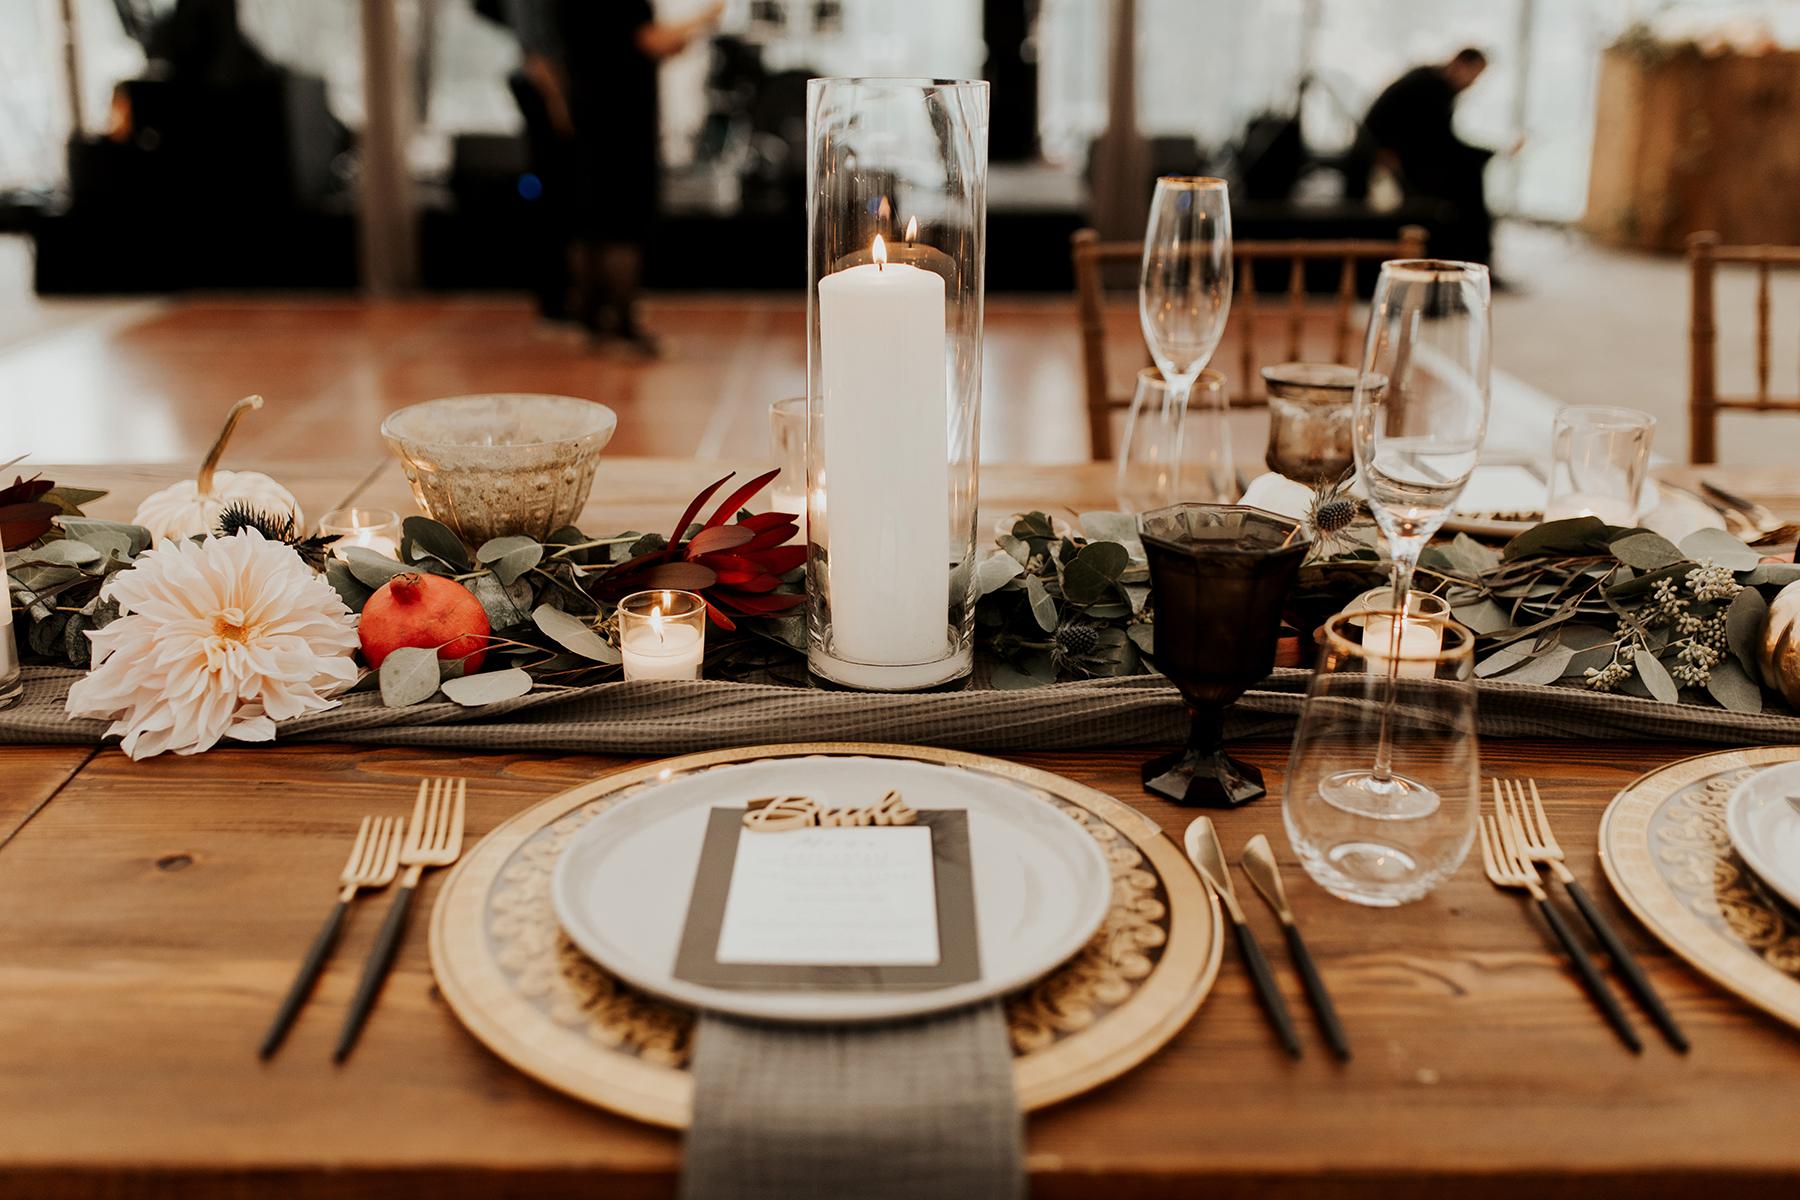 Katies Bliss Wedding Receptionv